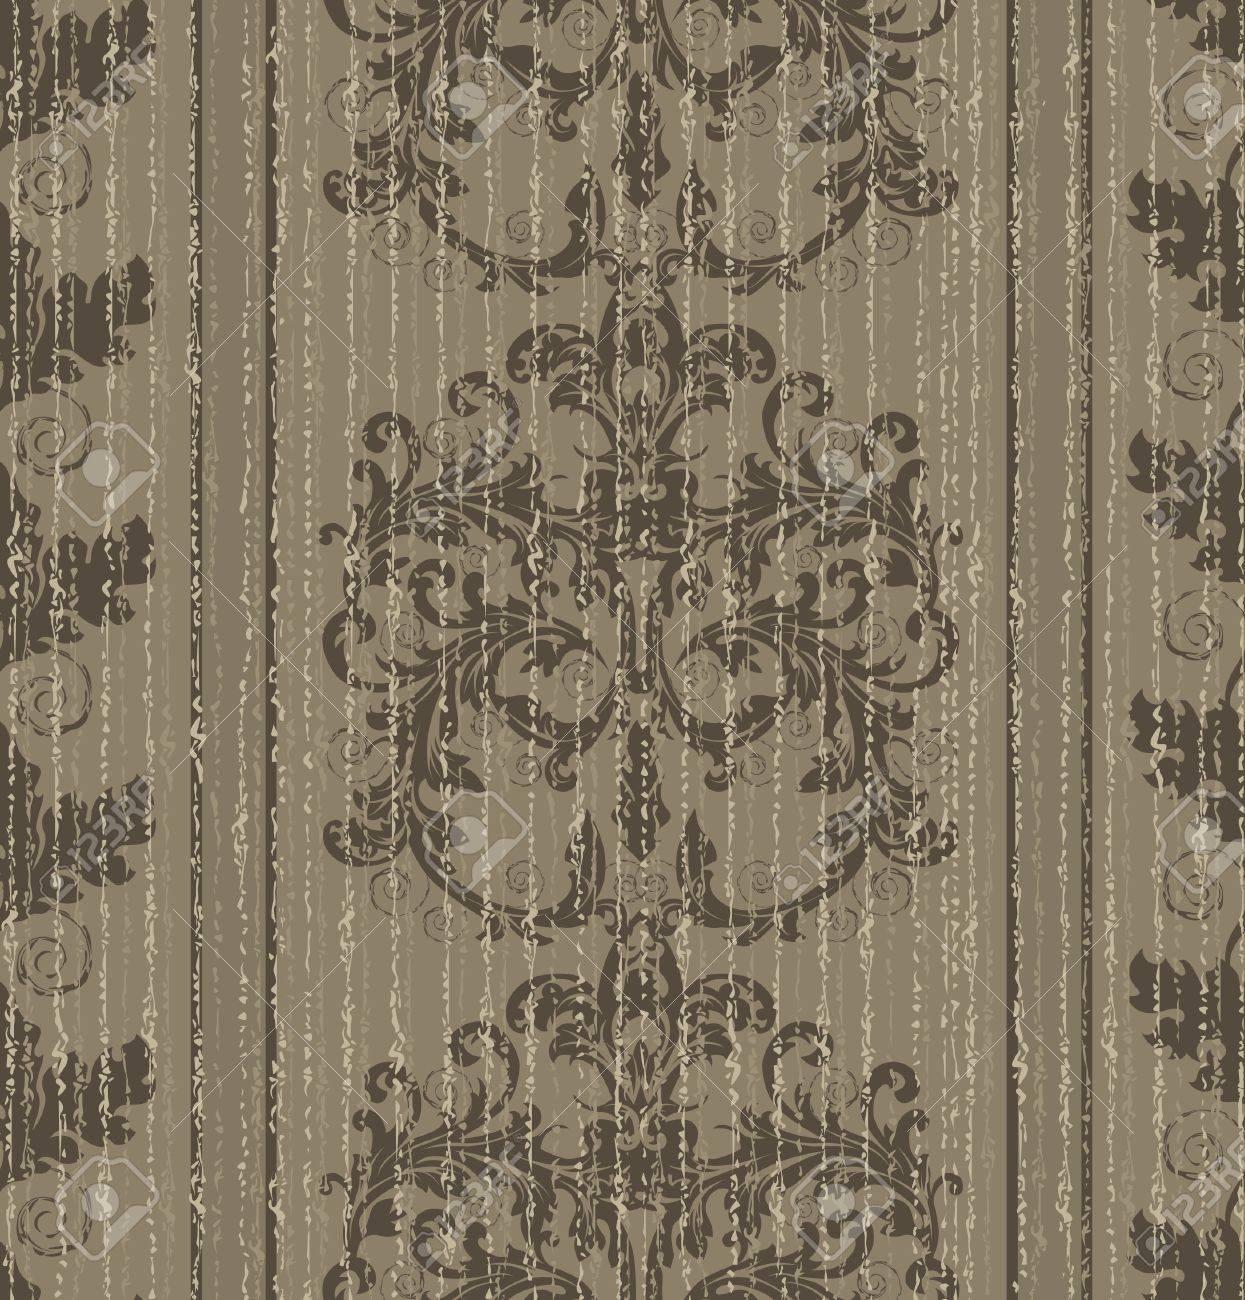 foto de archivo seamless papel tapiz barroco antiguo